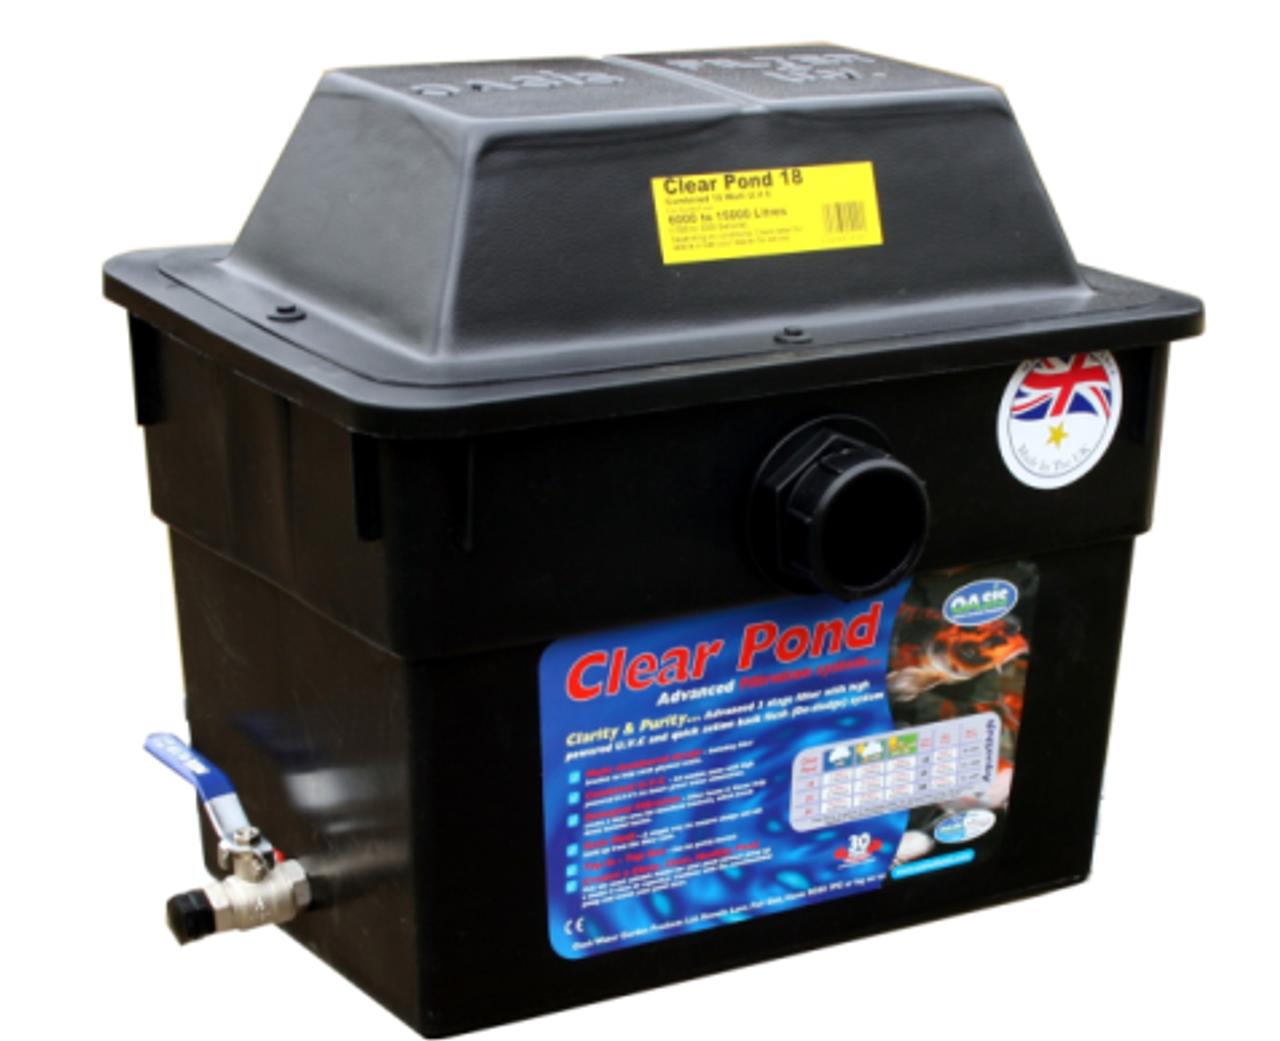 Lotus oasis CLEARPOND advanced 7 étape 18,25,50,80 filtre uv box clear pond fish